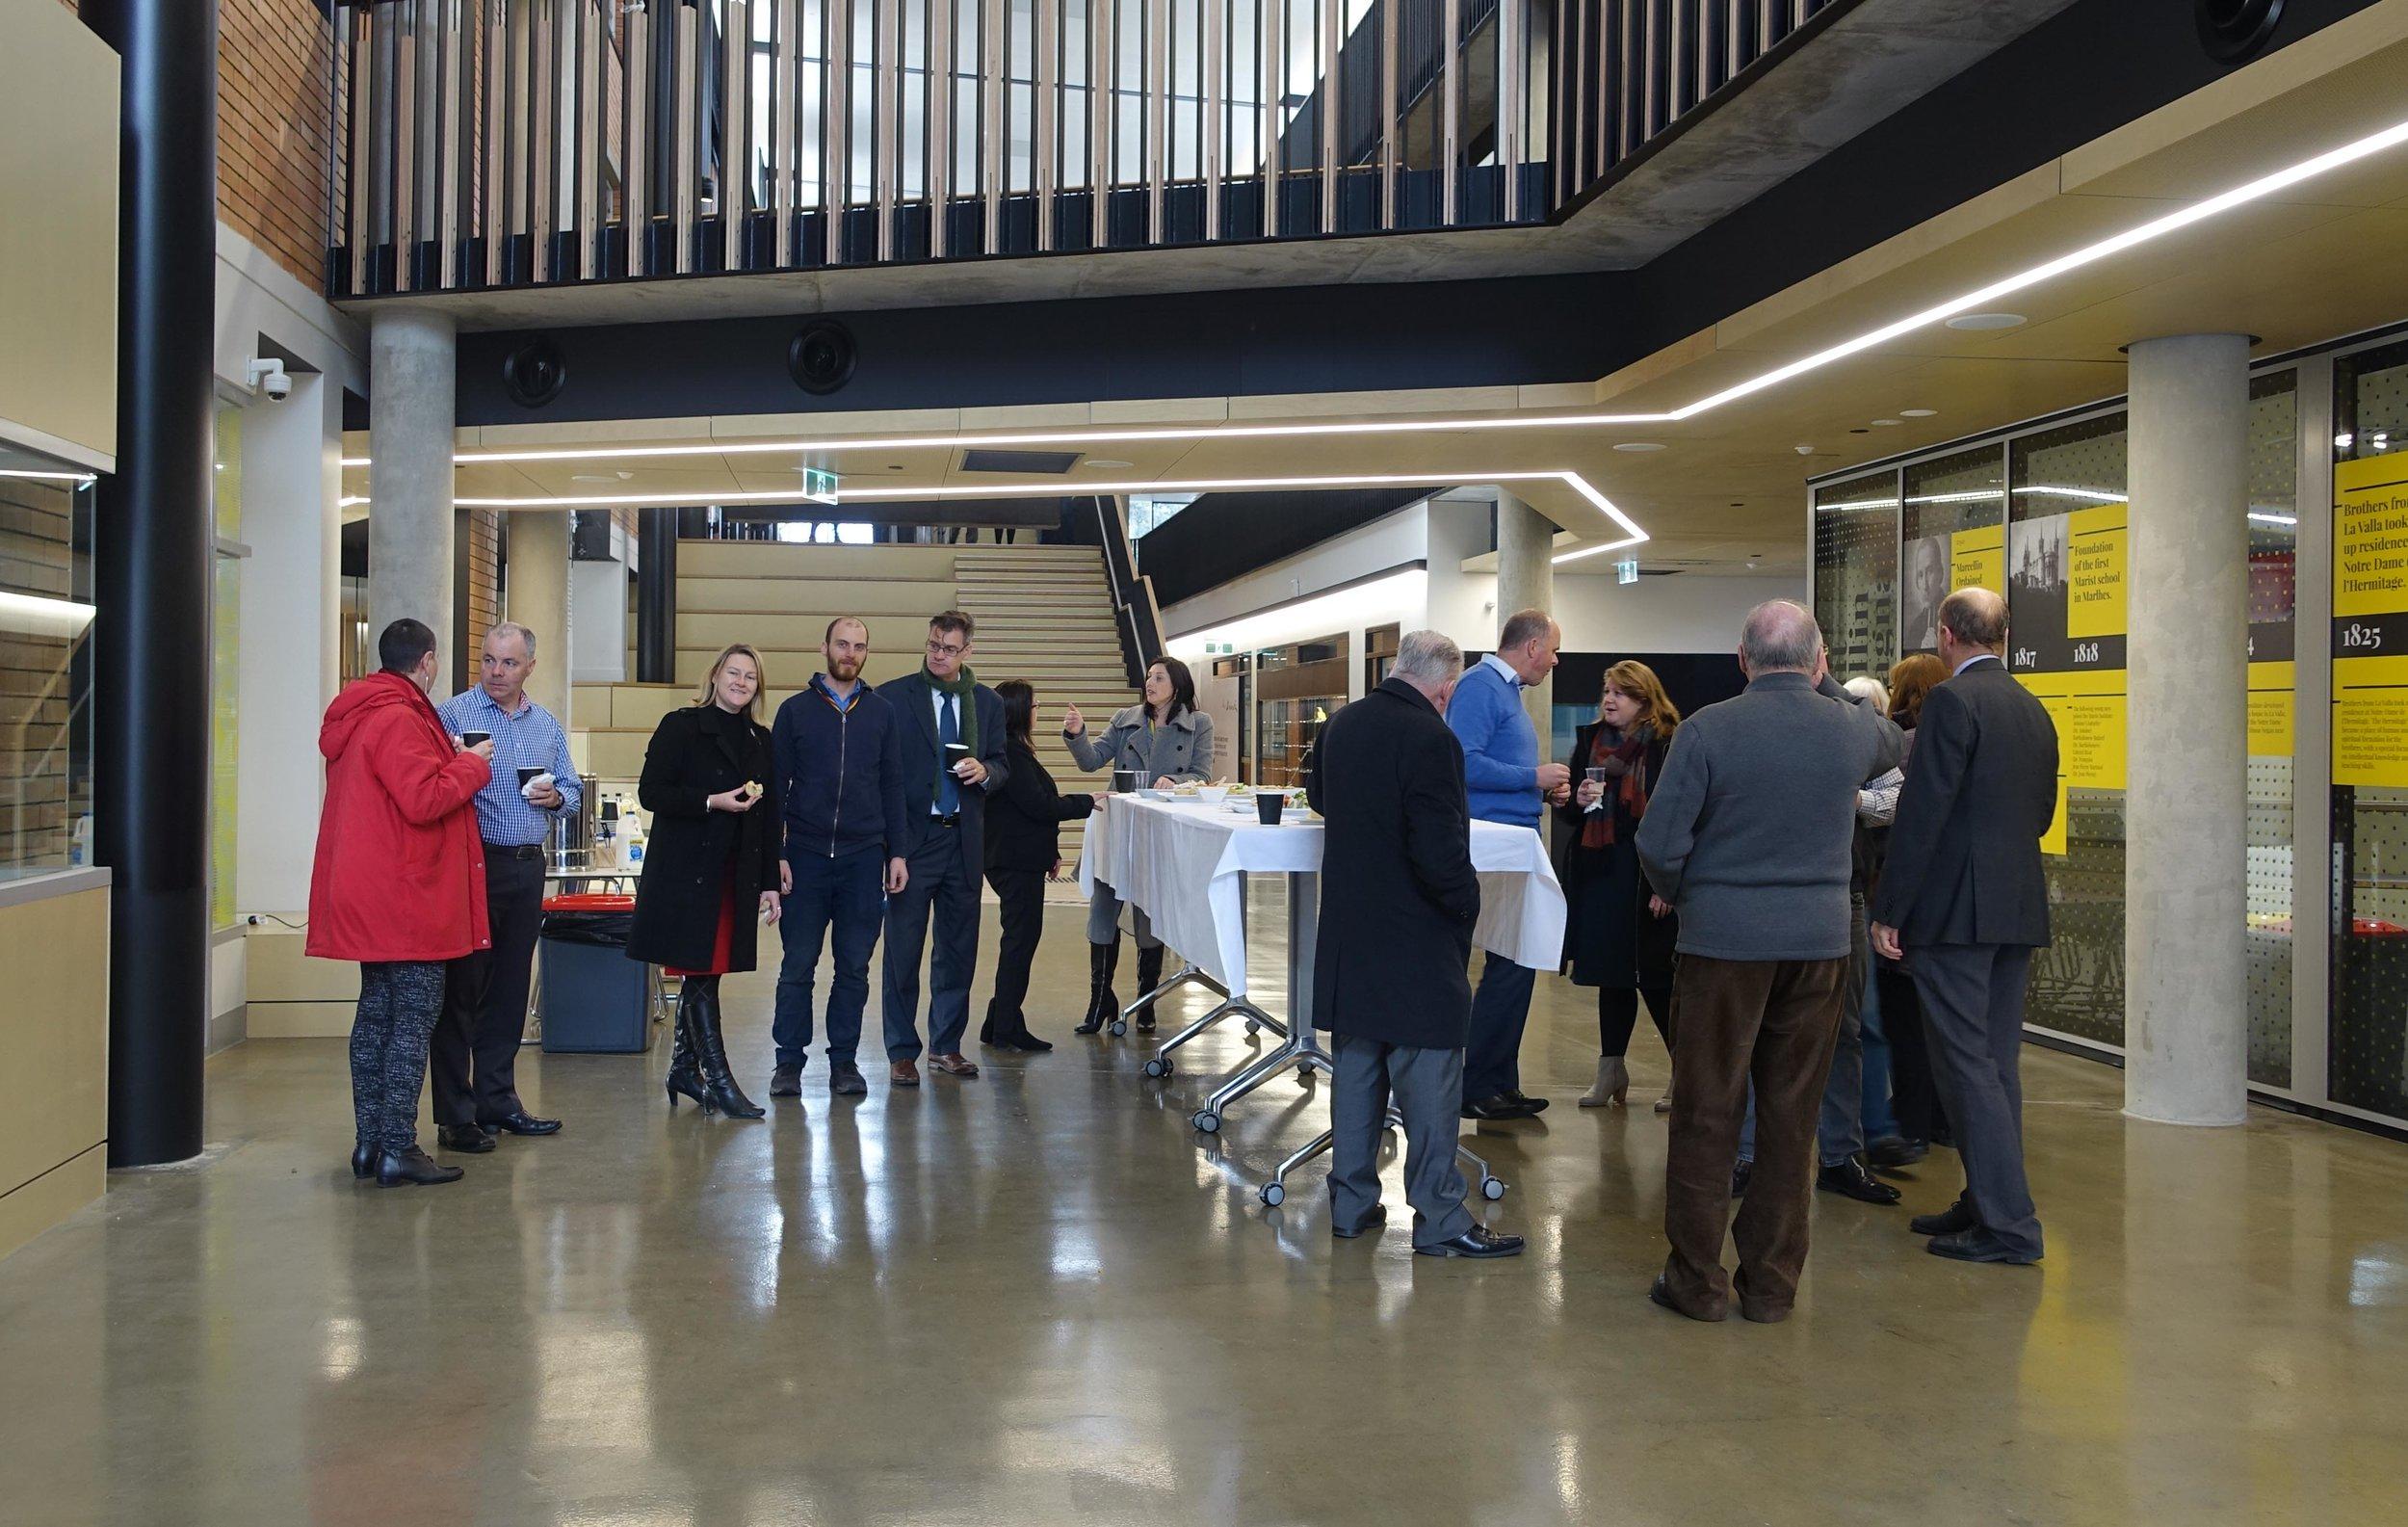 Melbourne Gathering Marcellin College-1-2.jpg